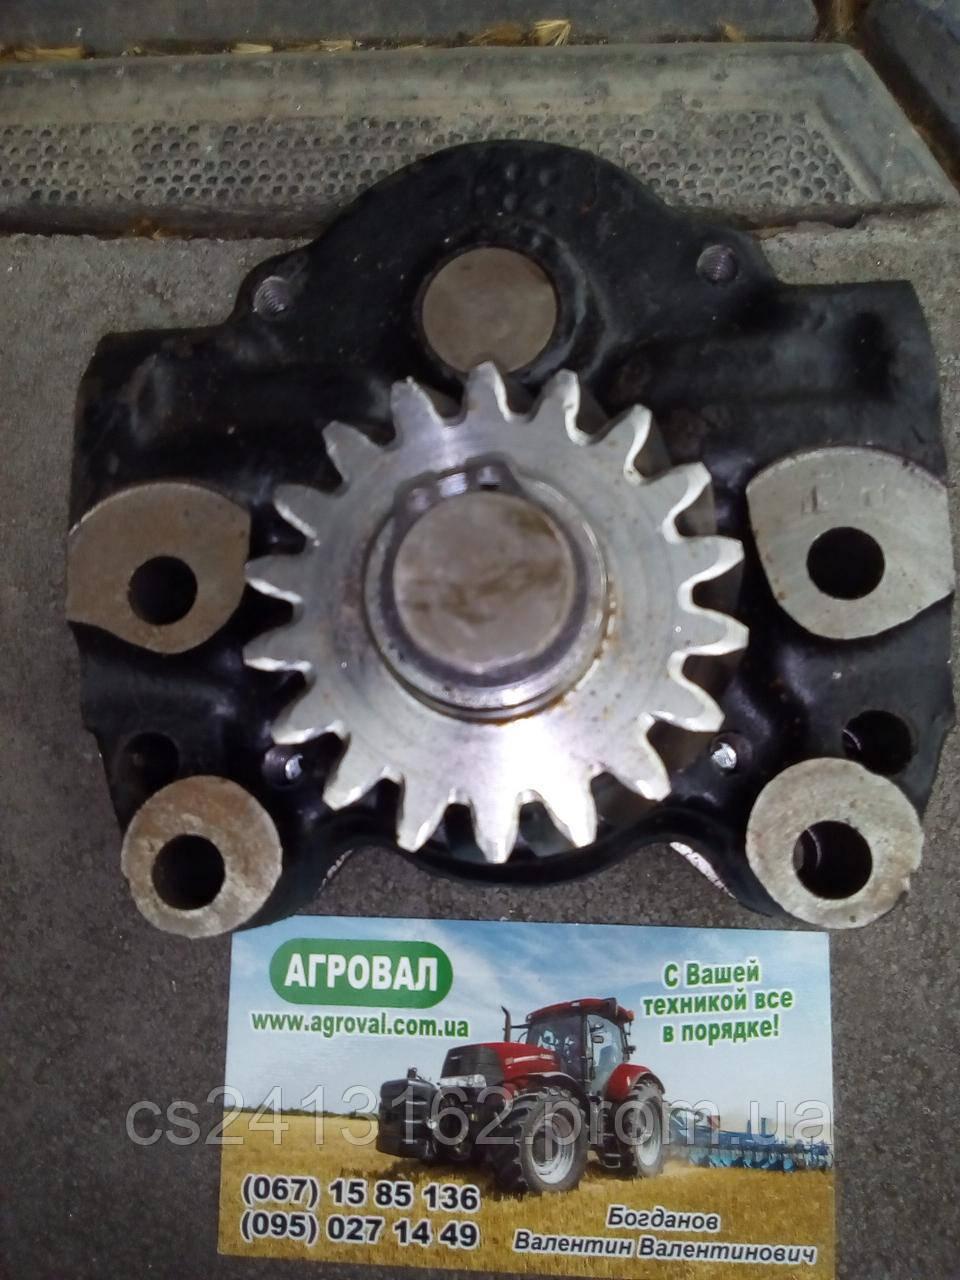 Масляный насос на трактора Т 25, Т-40 Польша Д144-1403010-310